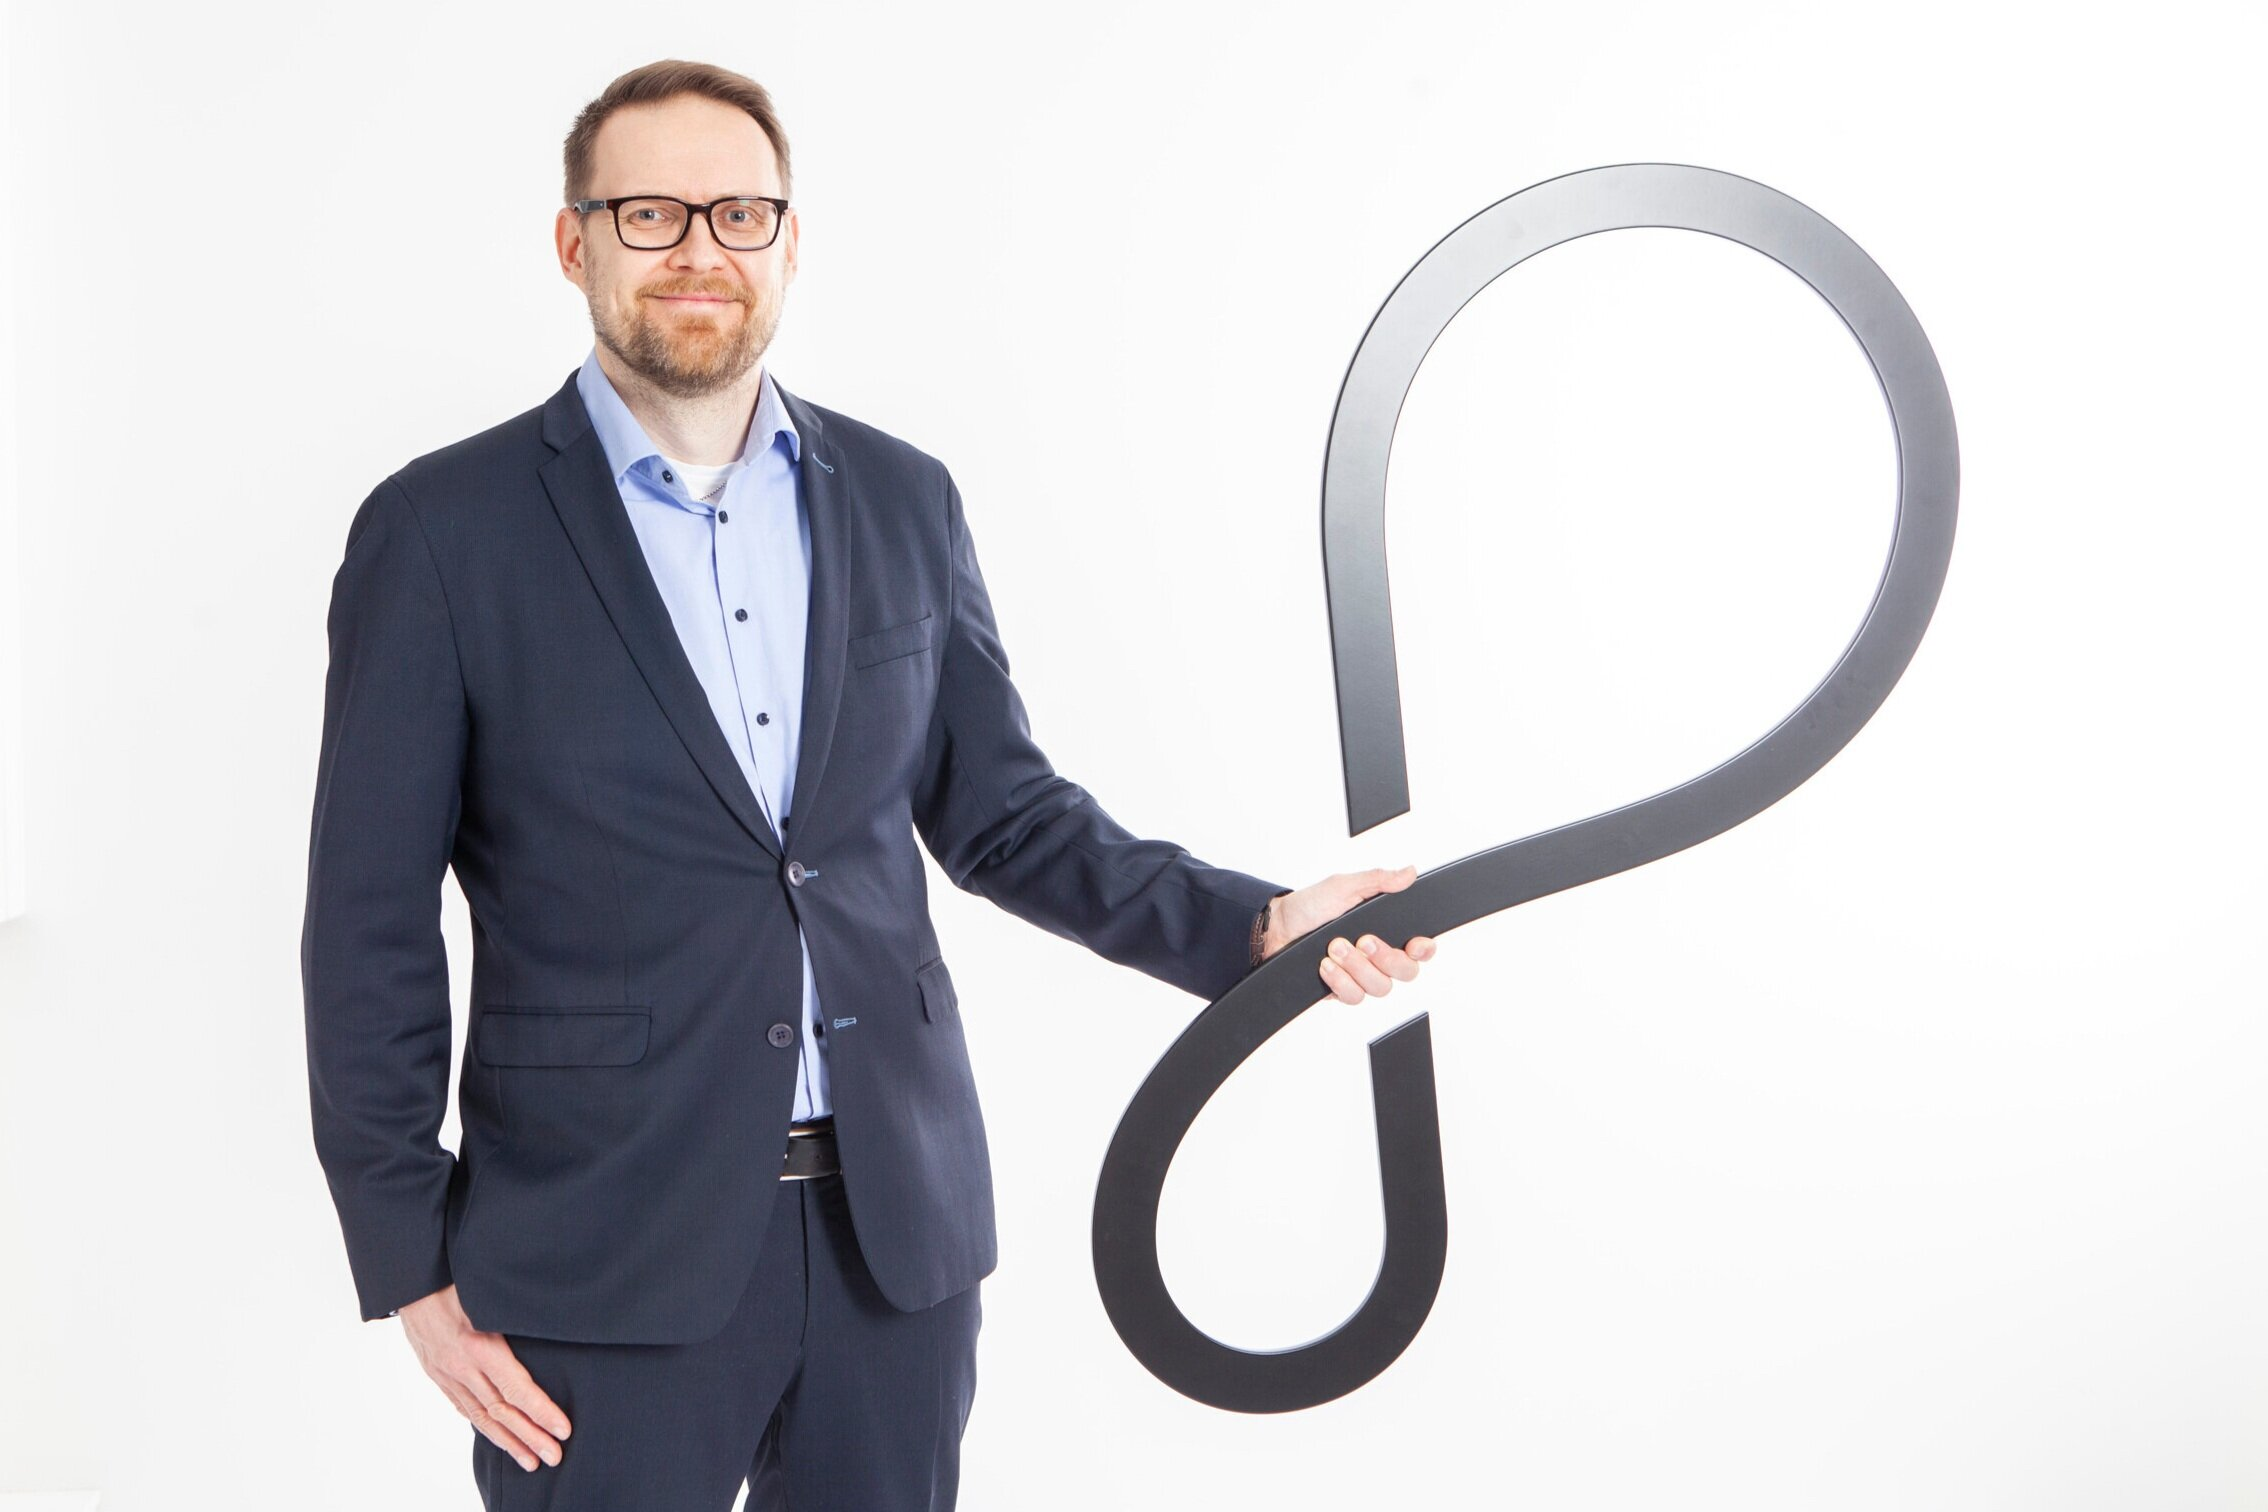 tomas Mustonen,首席执行官Paptic创始人之一必威app精装版苹果版